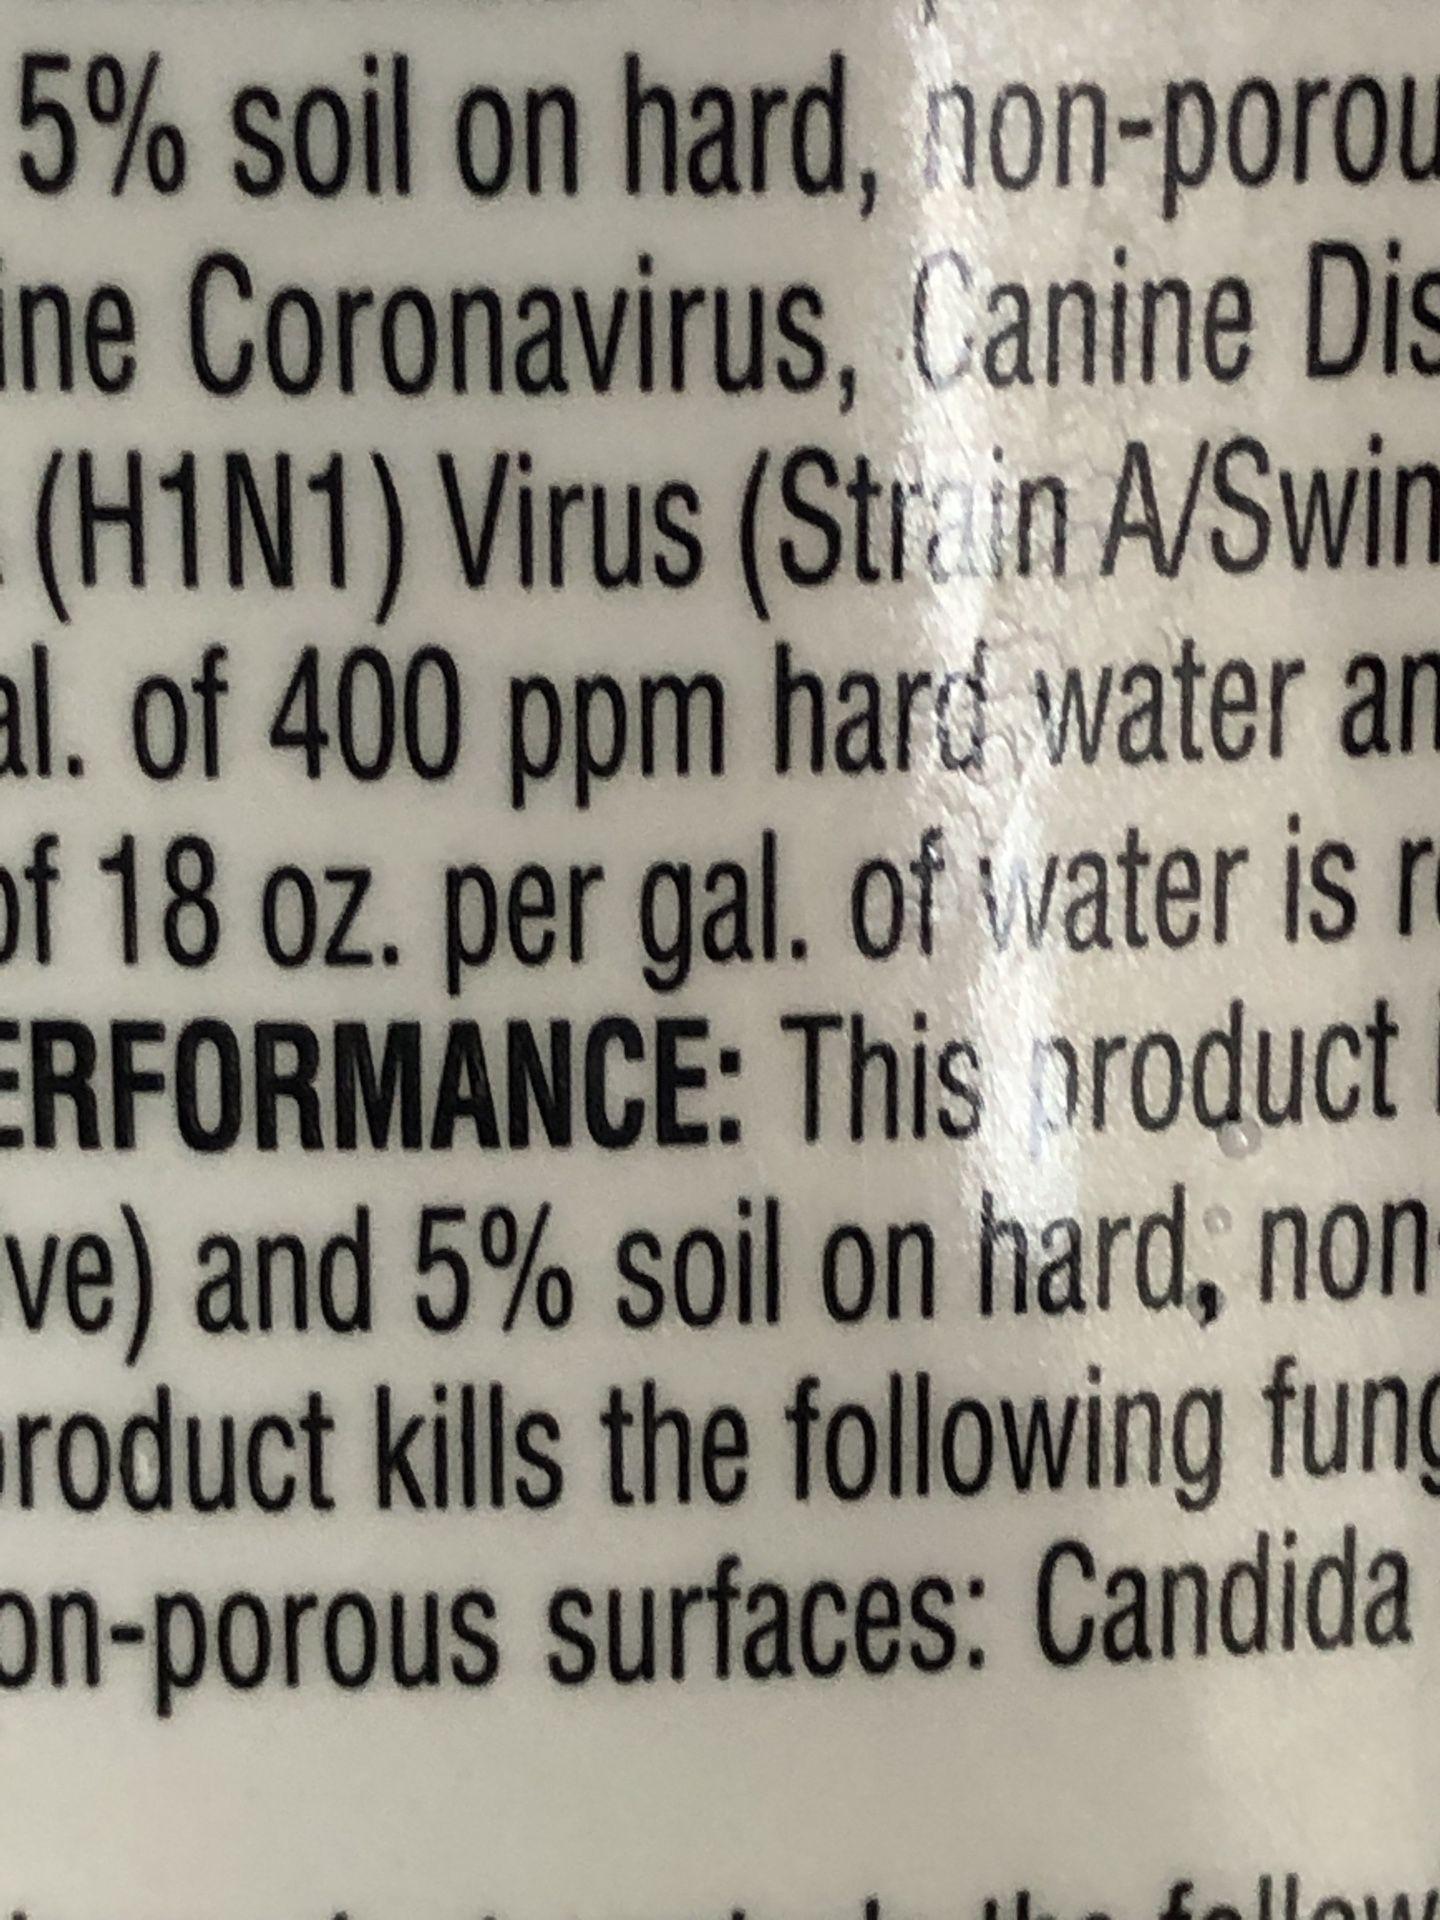 Sanitizer/disinfectant